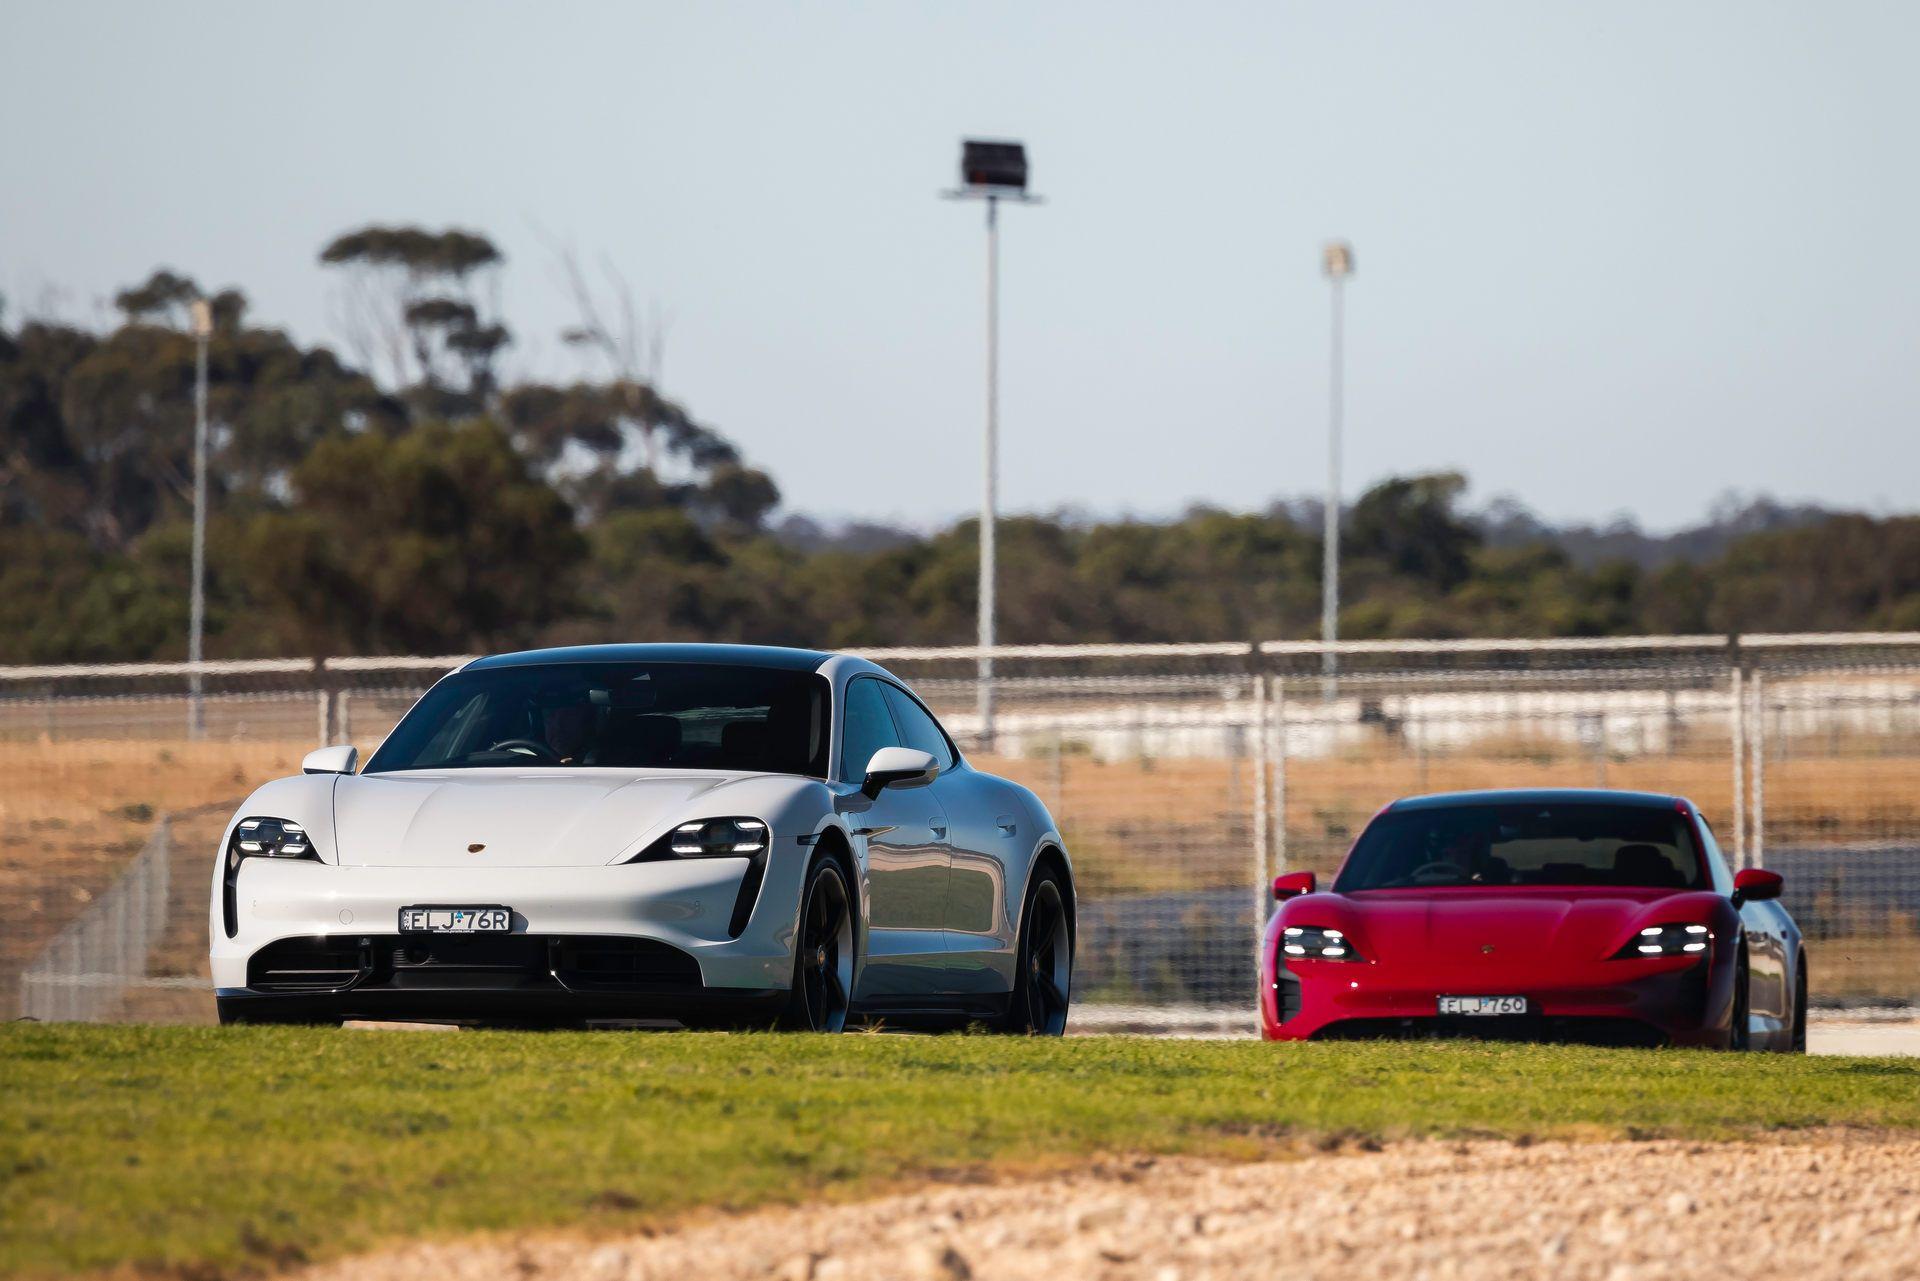 Porsche-Taycan-Turbo-S-The-Bend-Motorsport-Park-33